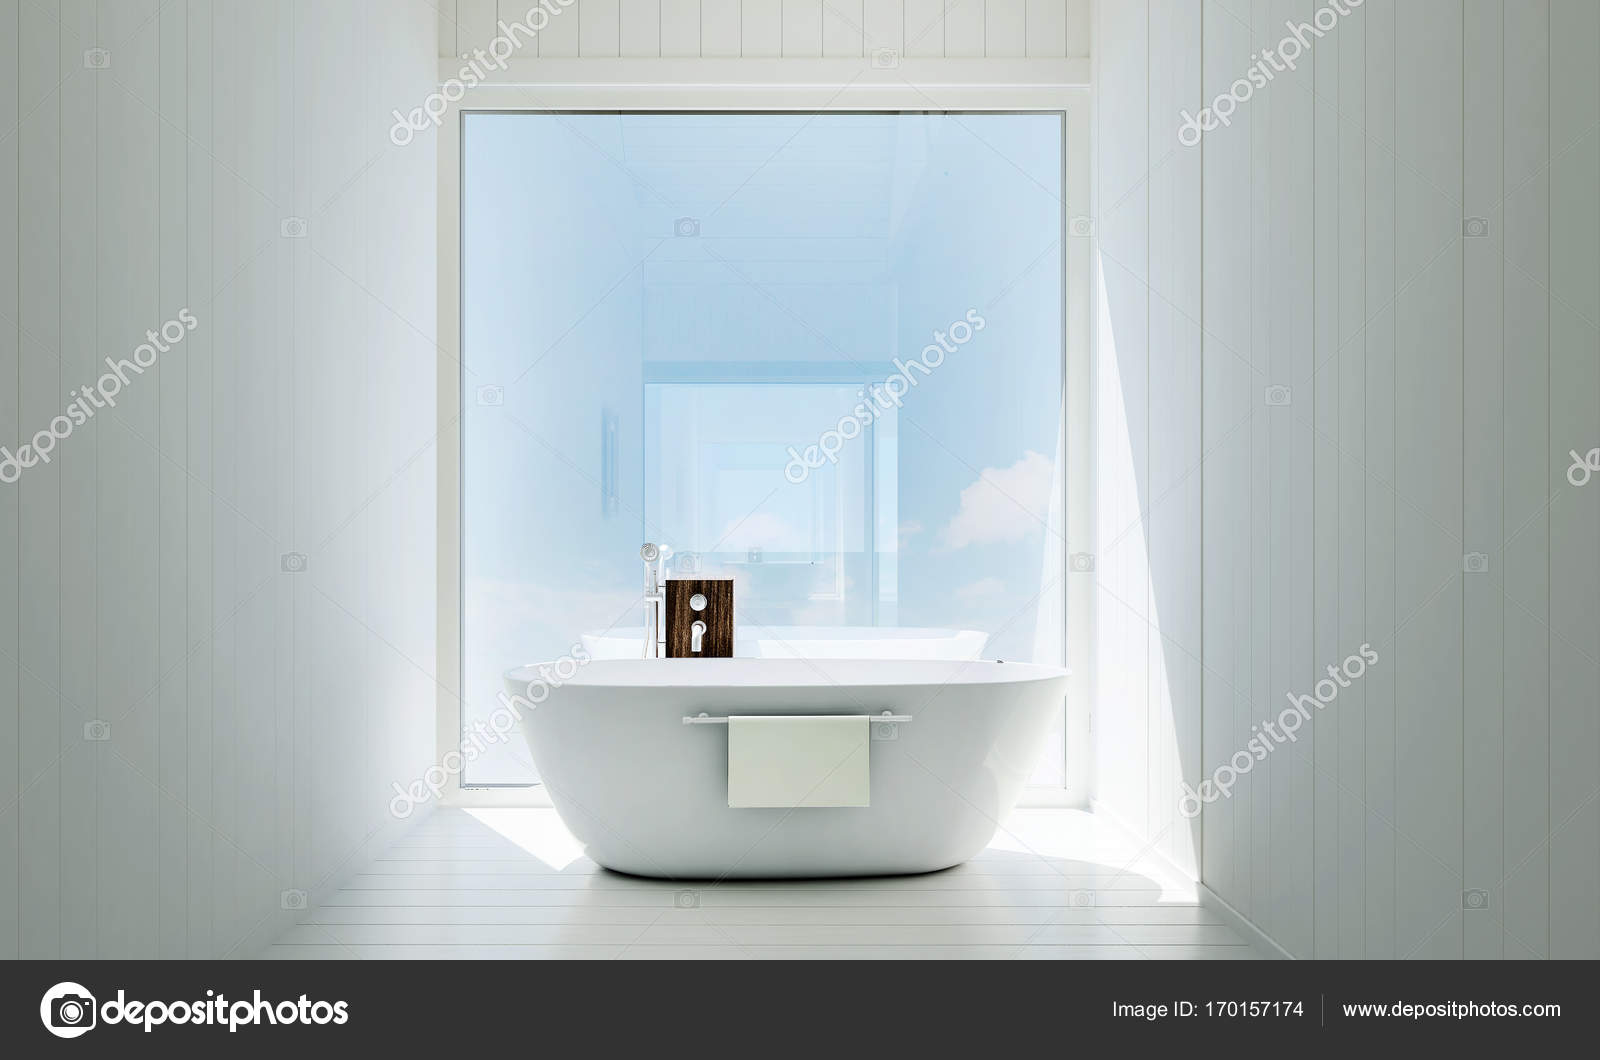 De minimale witte badkamer interieur en beton muur textuur ...